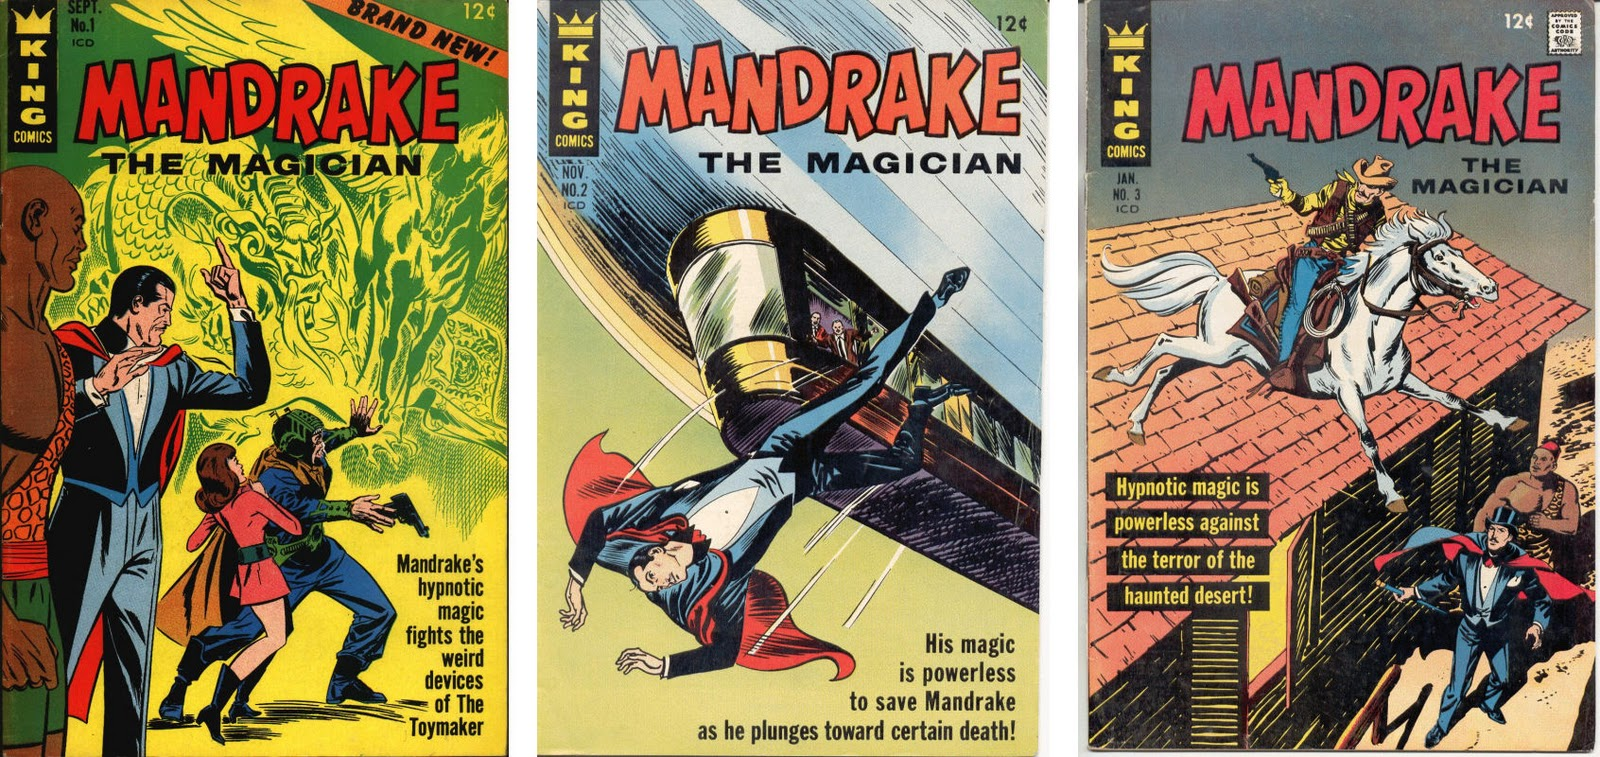 Old Comics world: Mandrake the Magician 01 - 10 (1966-67) - King